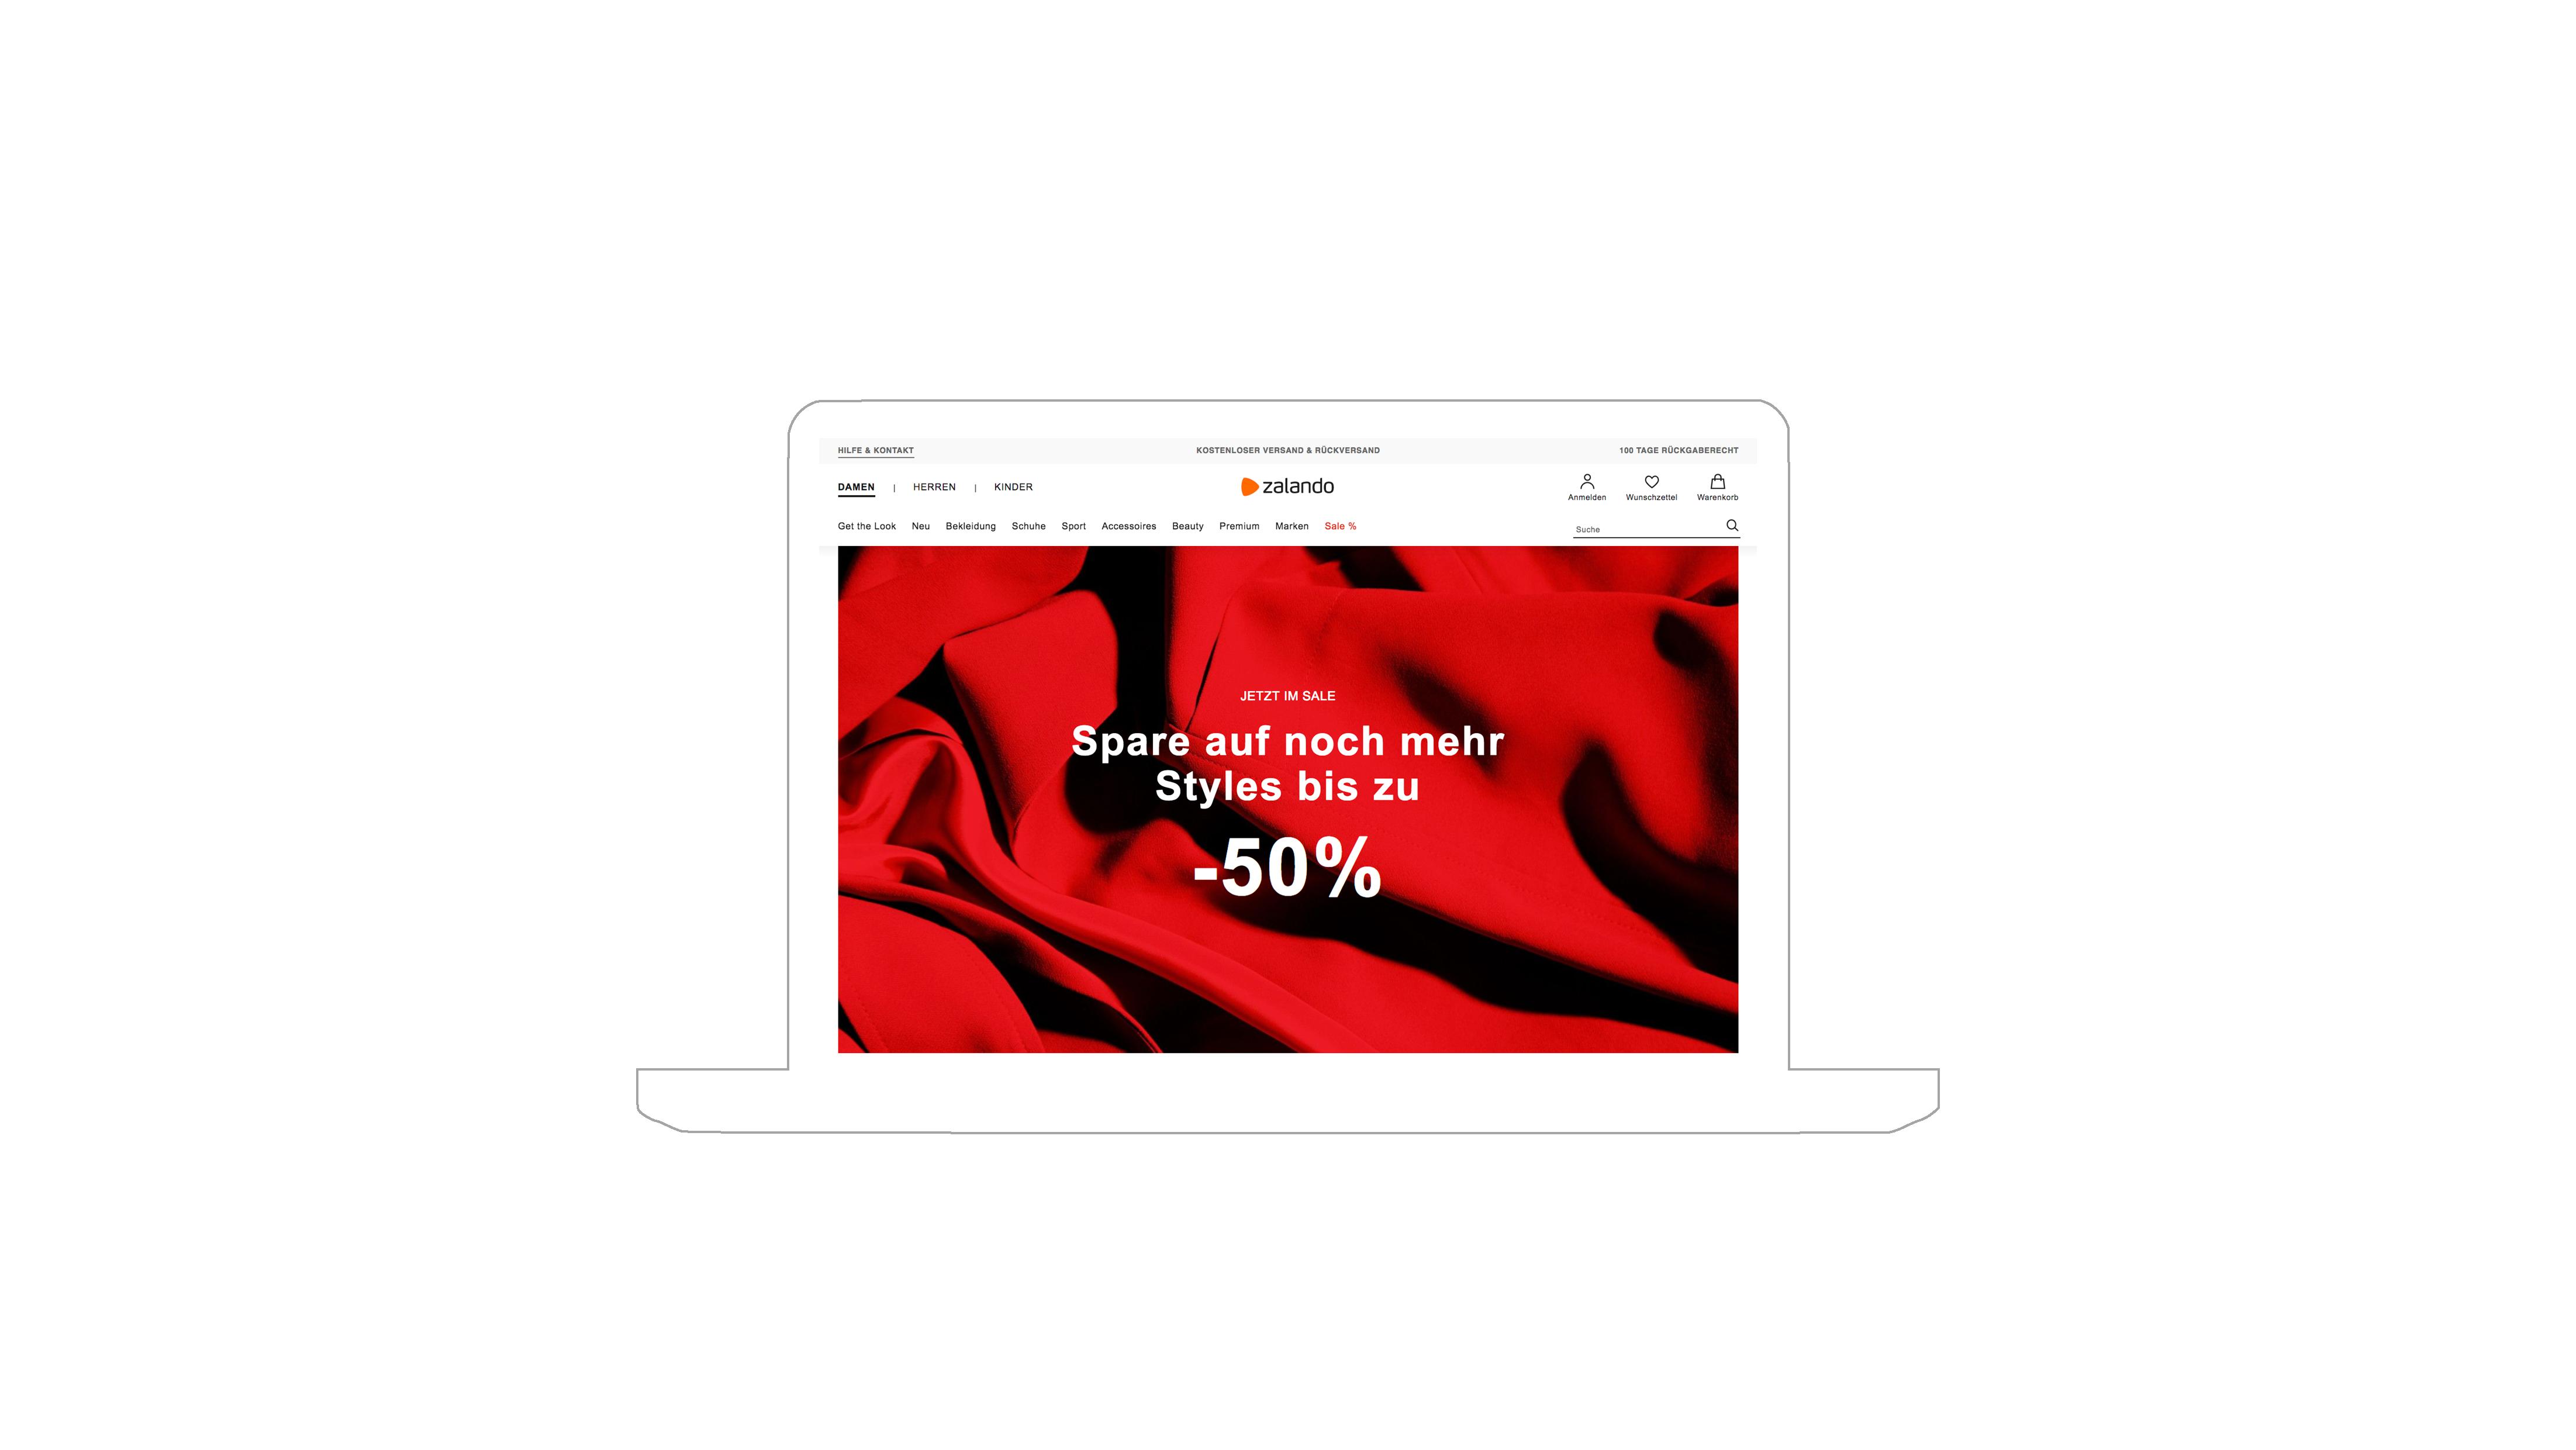 Nour, Alnader, Portfolio, Web, Zalando, Sale, Kampagne, Werbemittel, Advertising, Grafik, Illustration, Werbung, Ad, Online